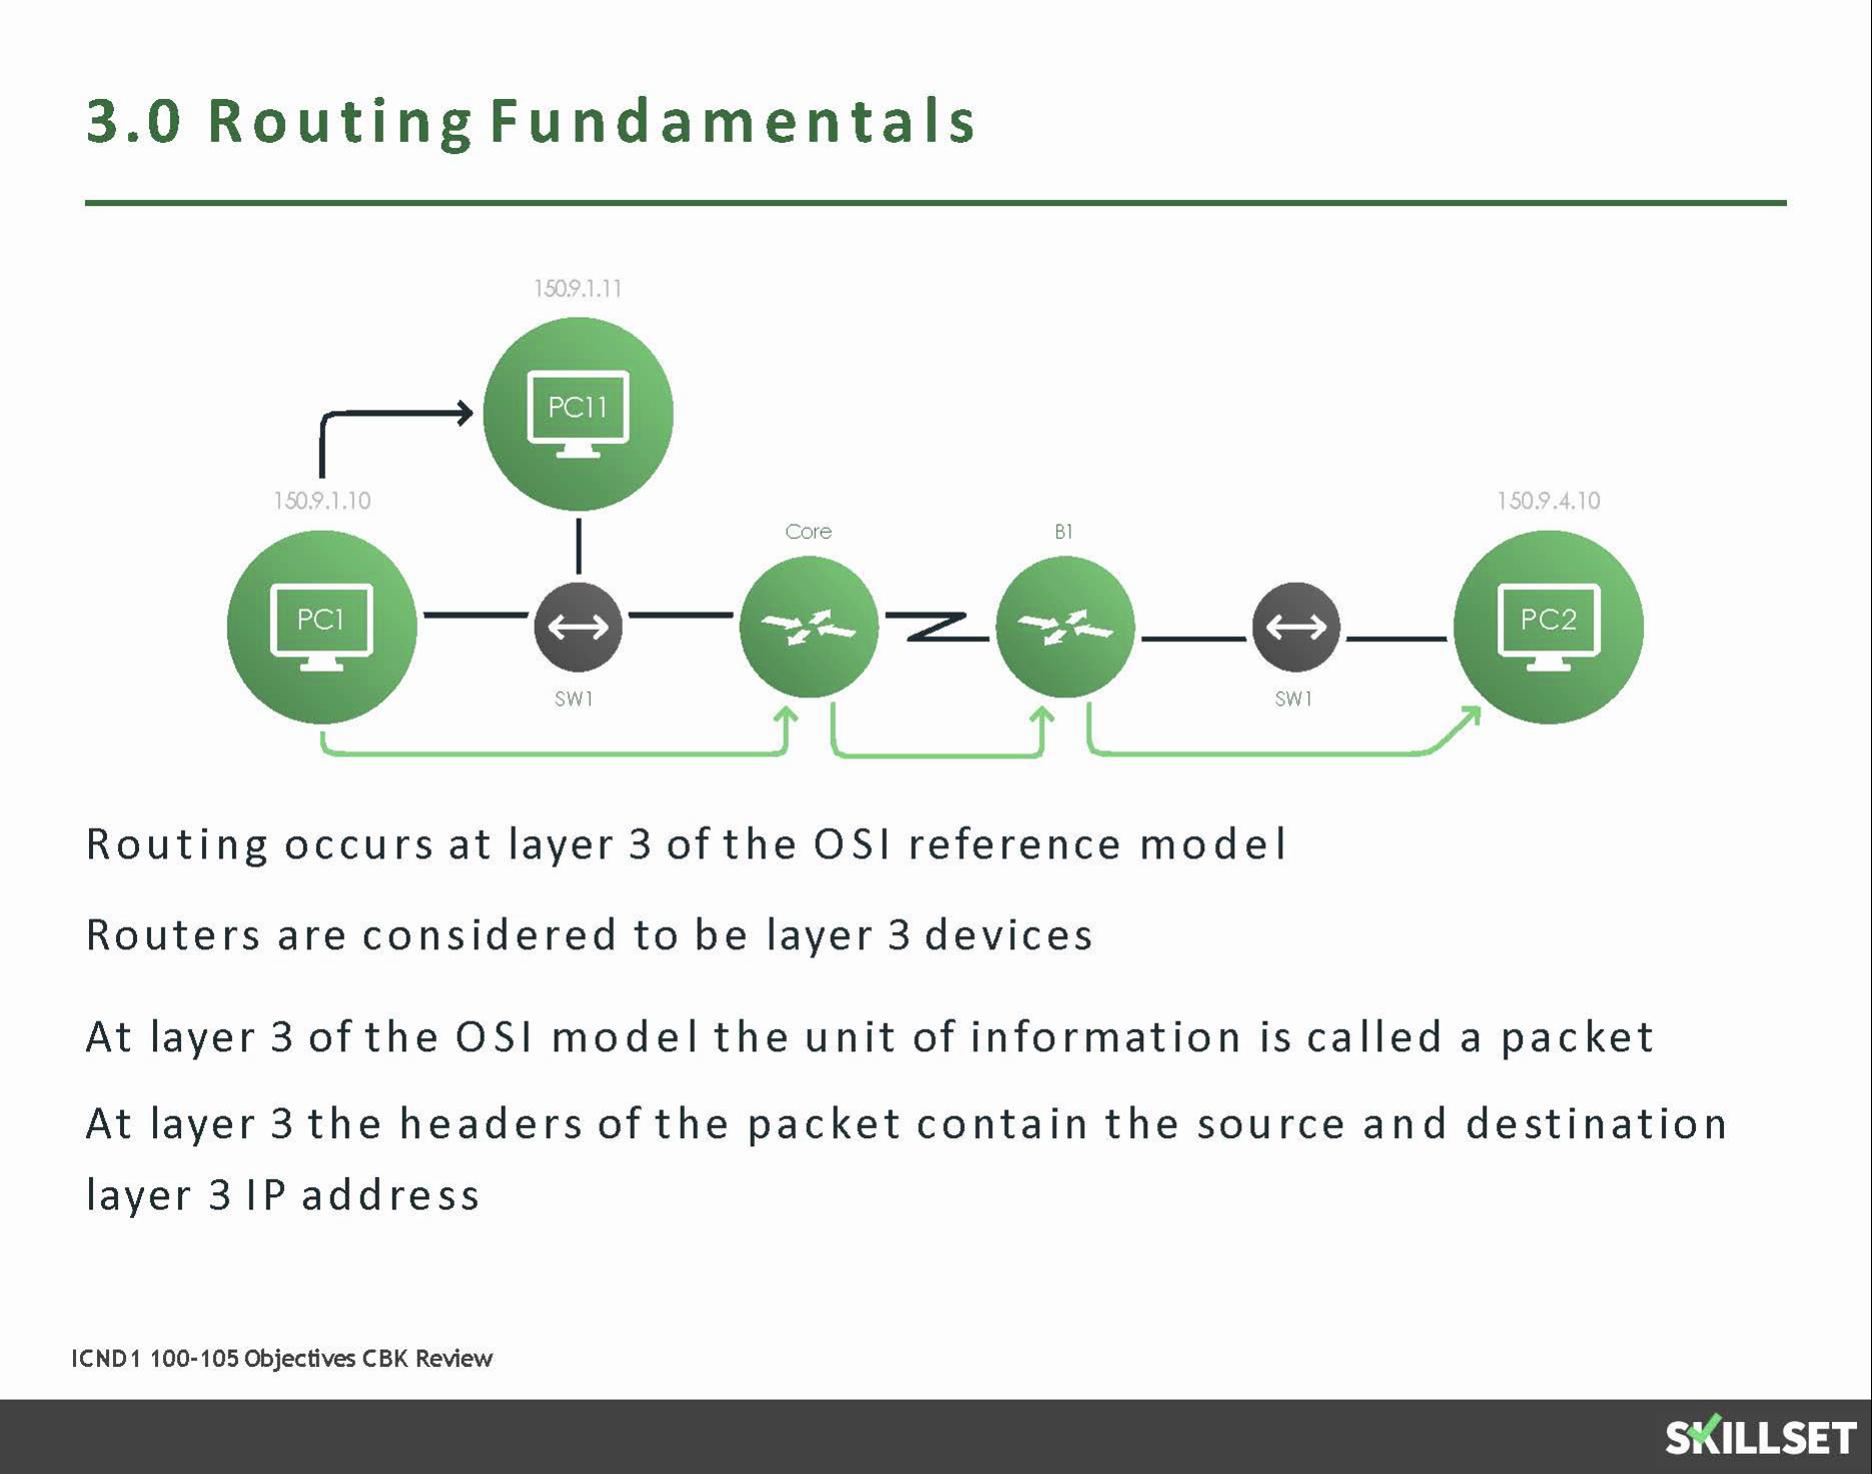 3.0 Routing Fundamentals